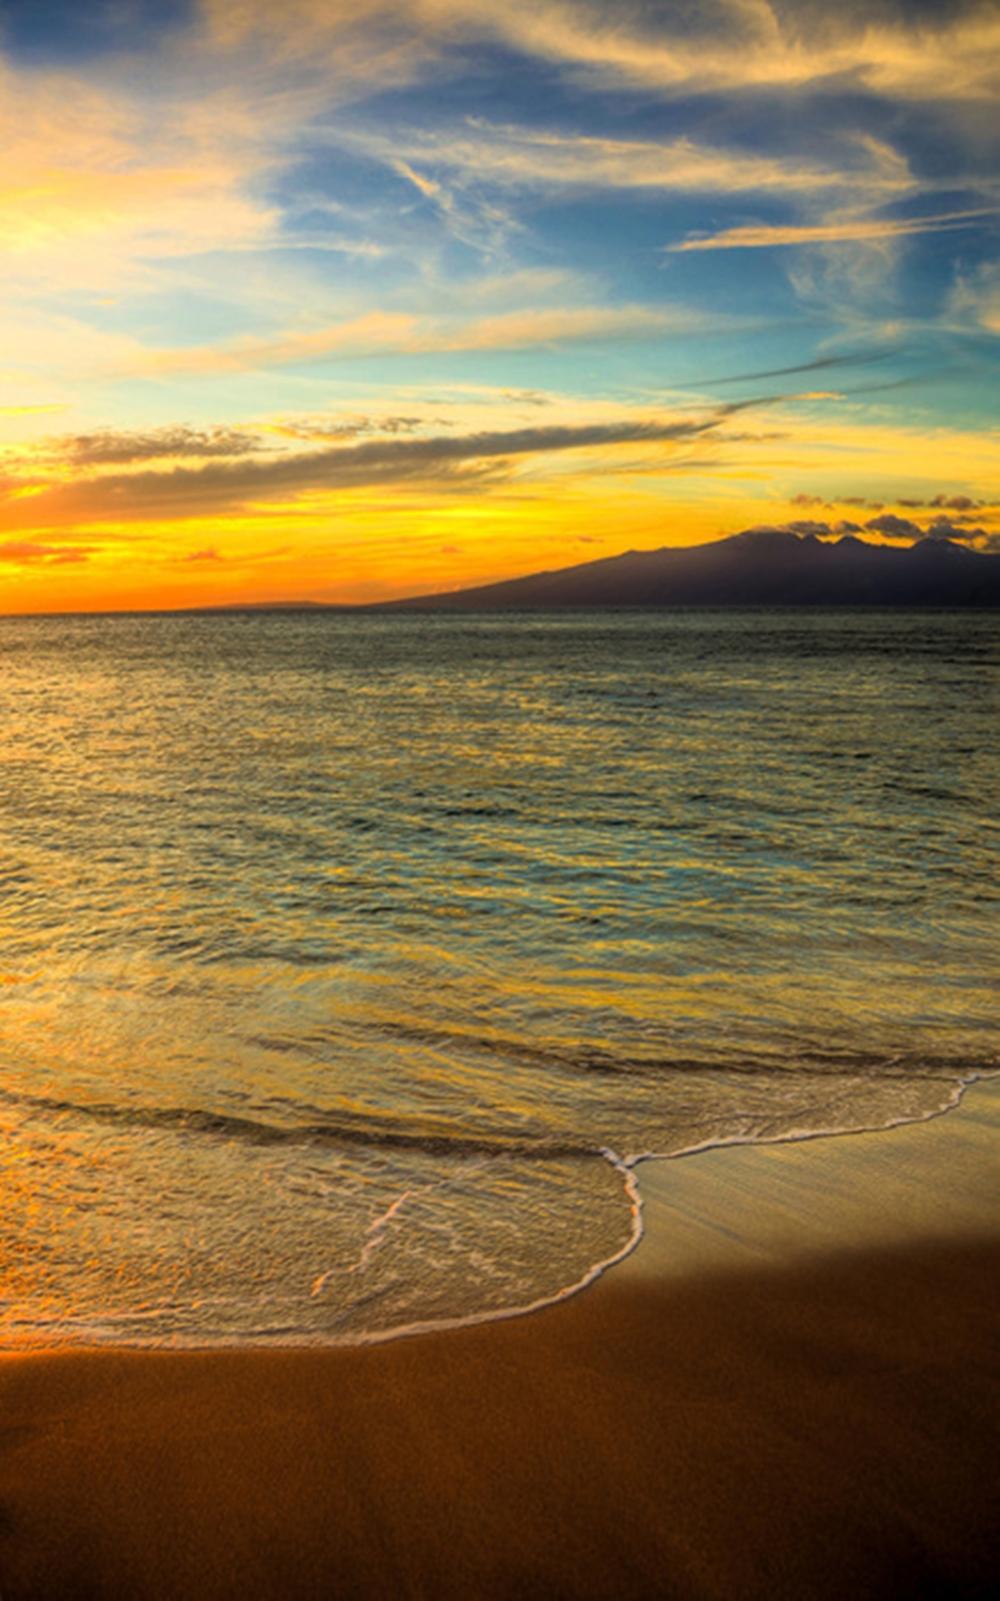 Kelly Wade - Maui Sunset Hawiian Islands